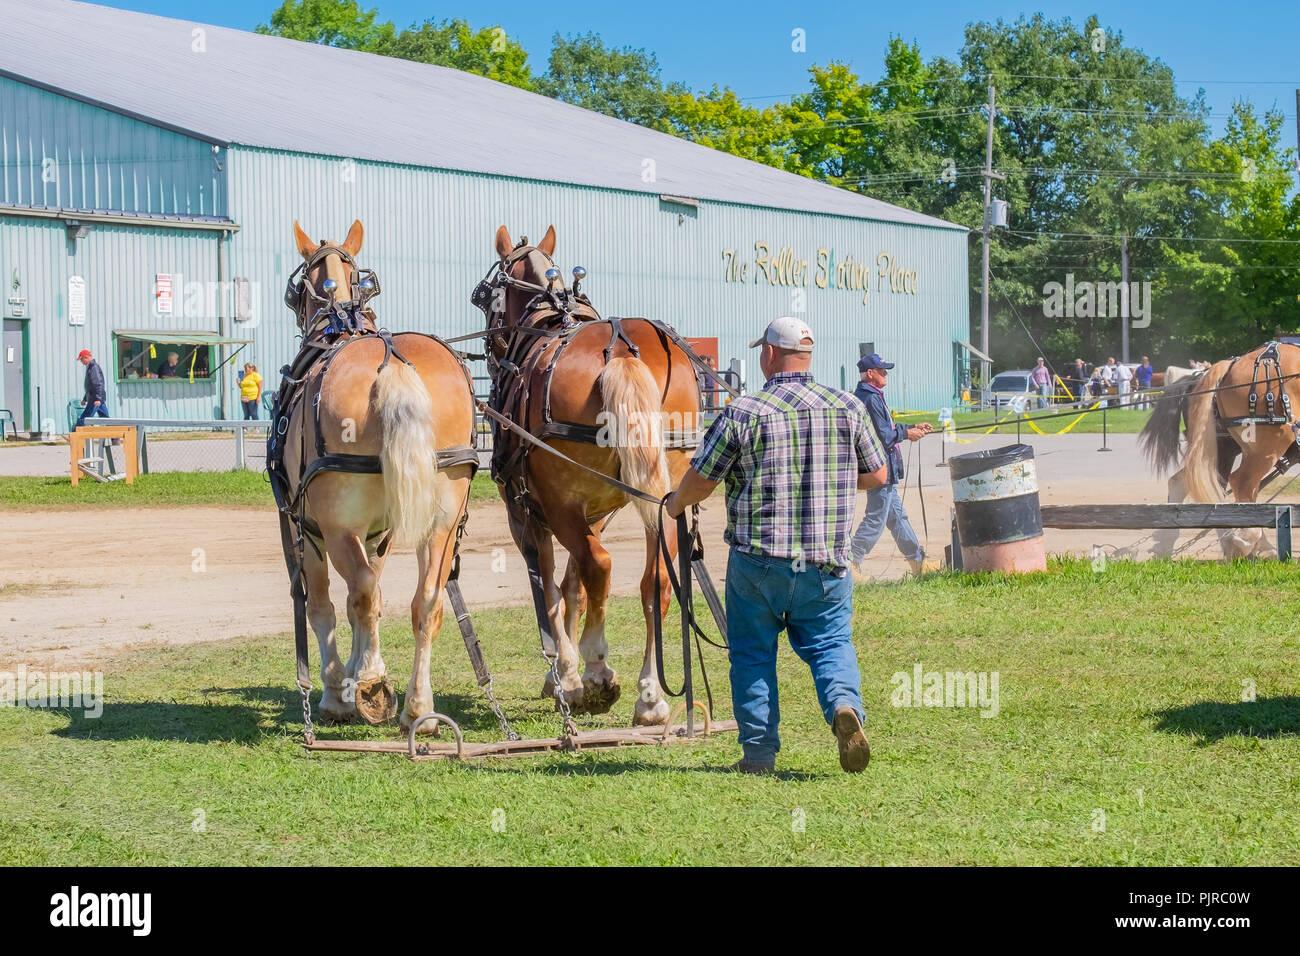 Draft Horses Stock Photos & Draft Horses Stock Images - Alamy